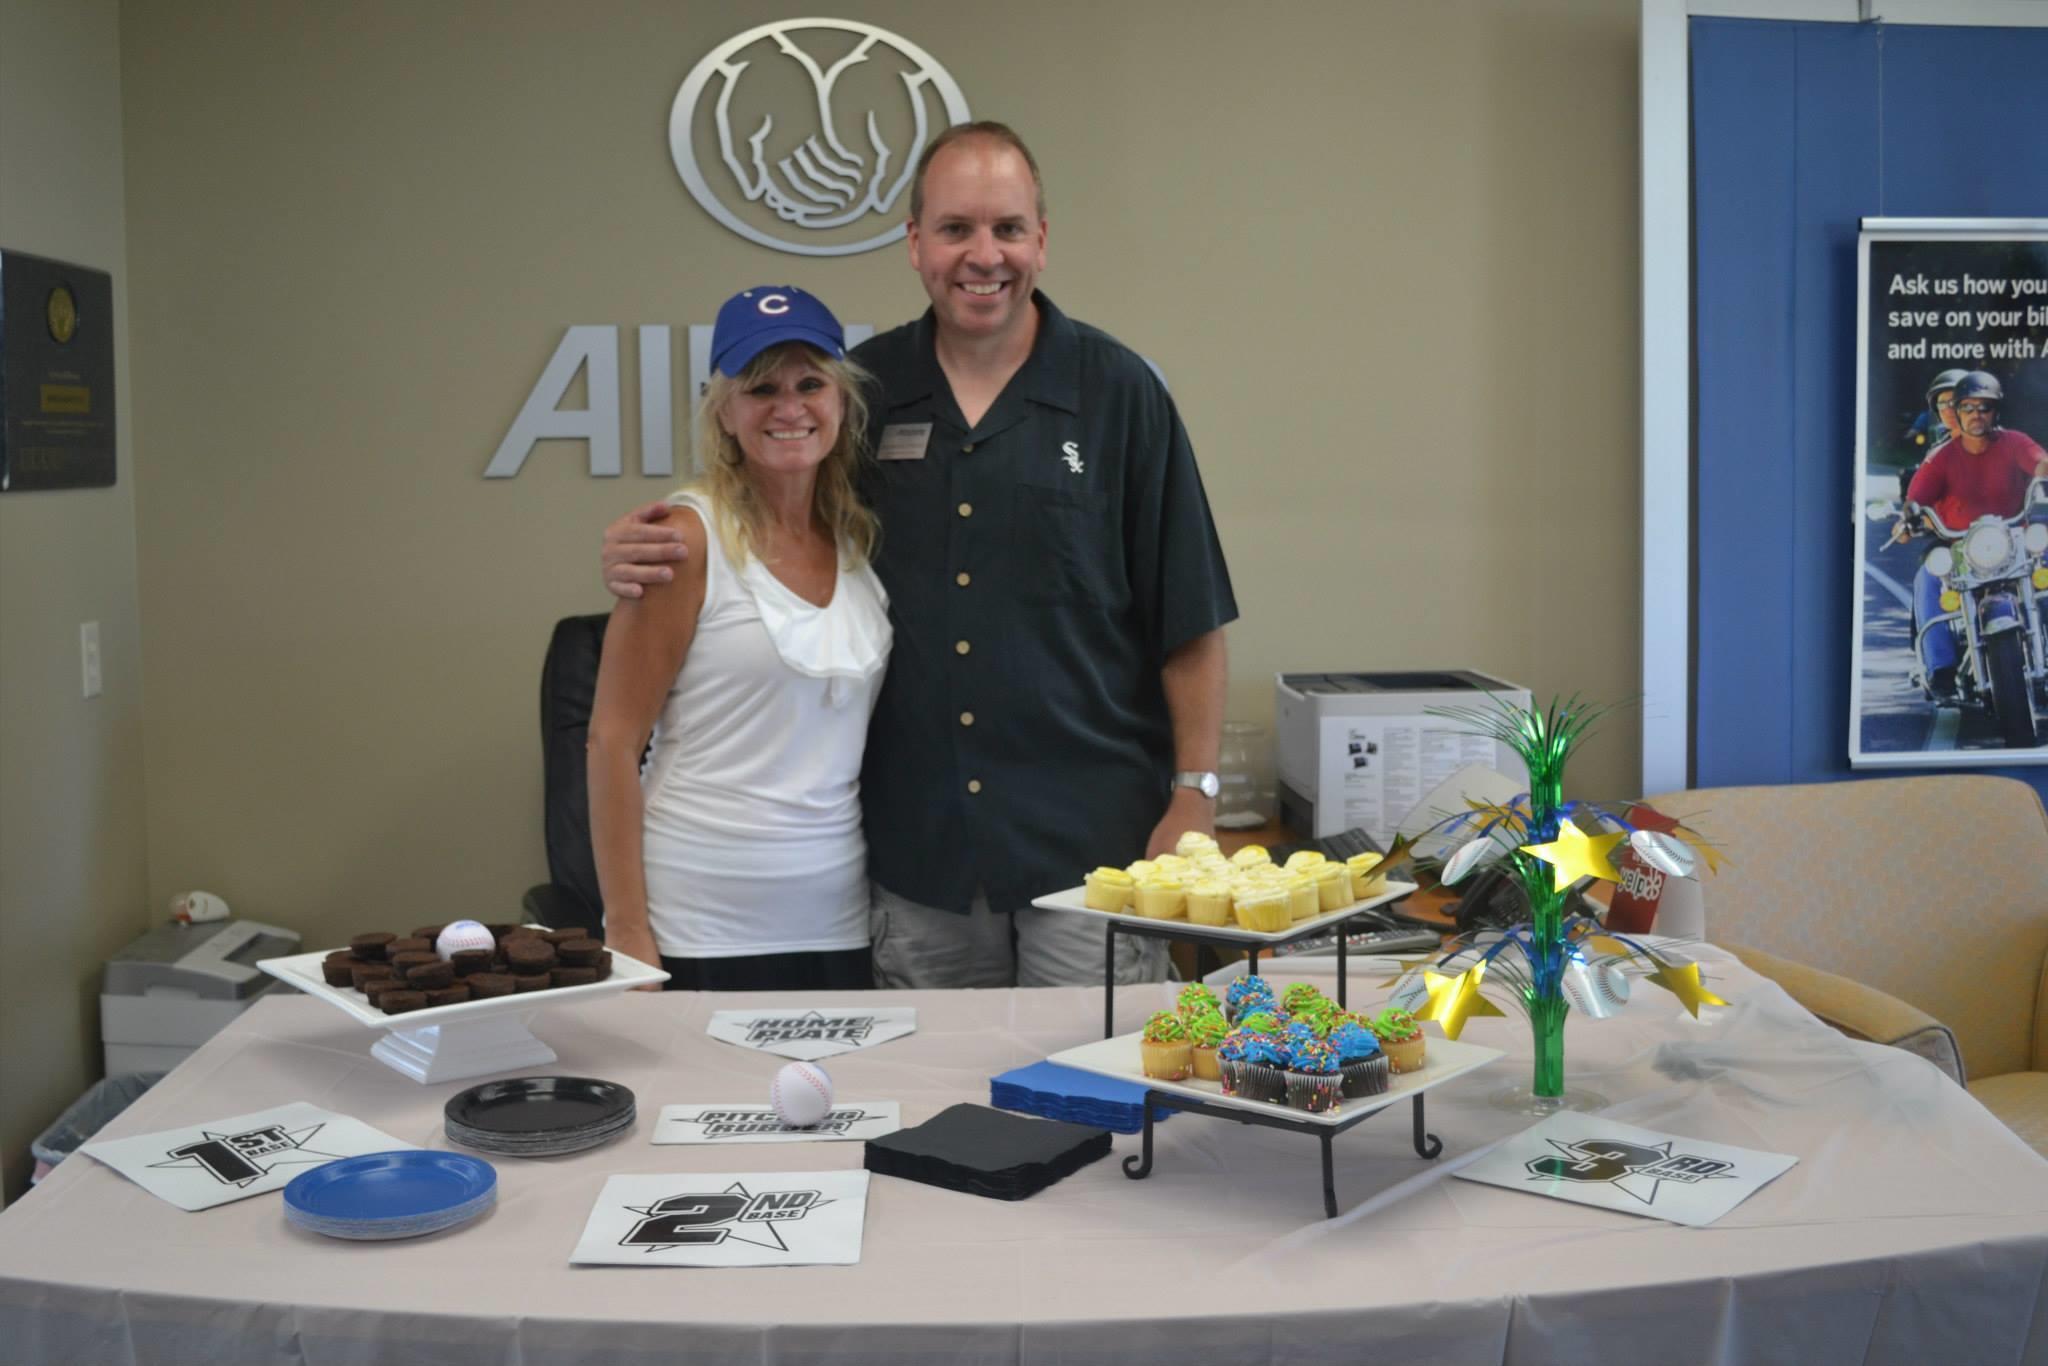 Gary Bonick: Allstate Insurance image 15